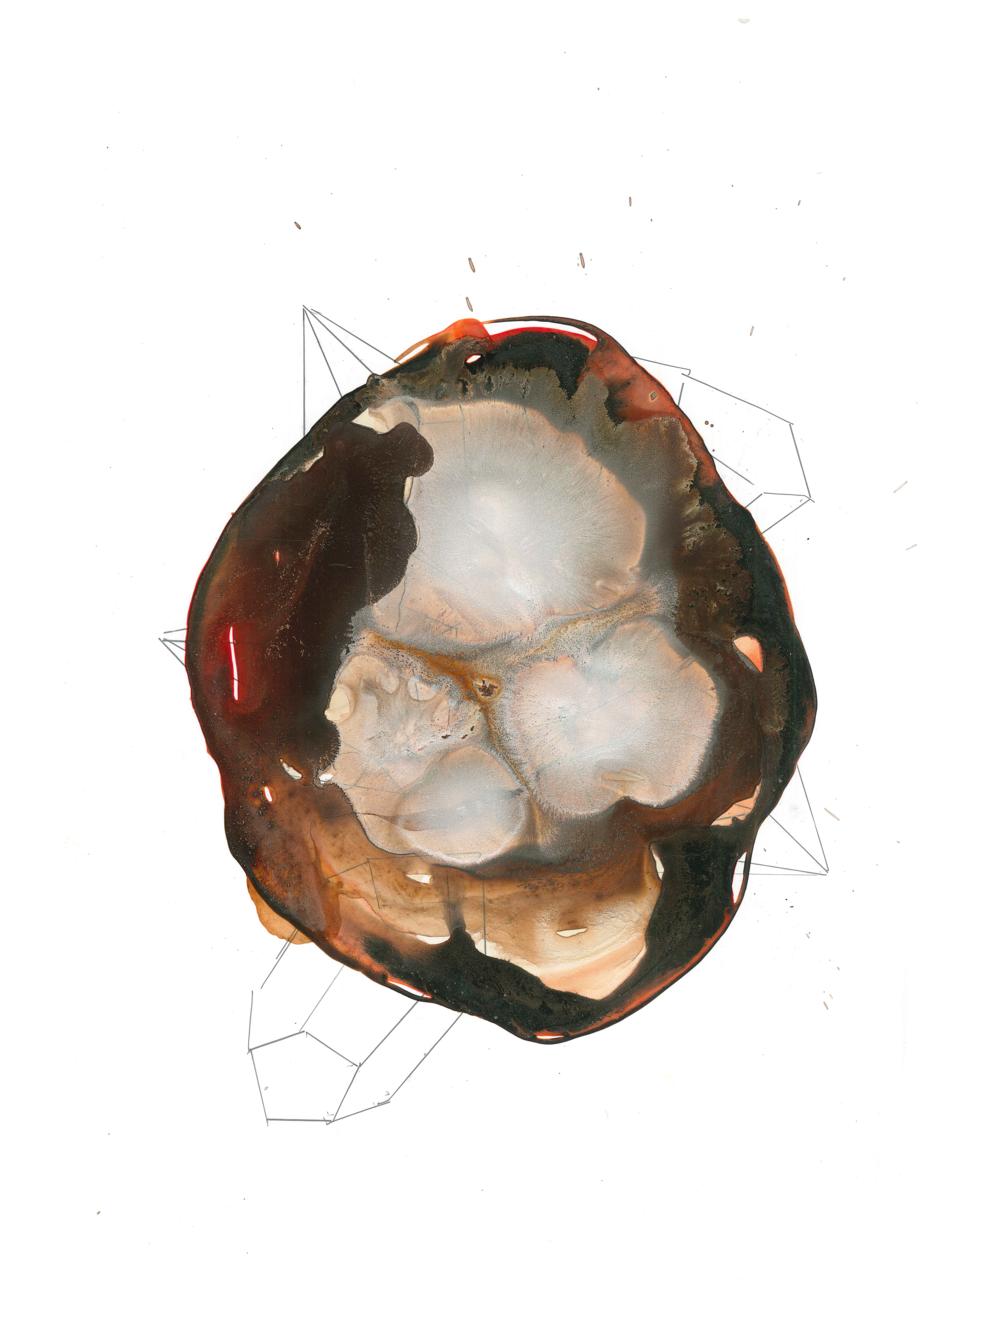 agate, crystals, gemstones9.png